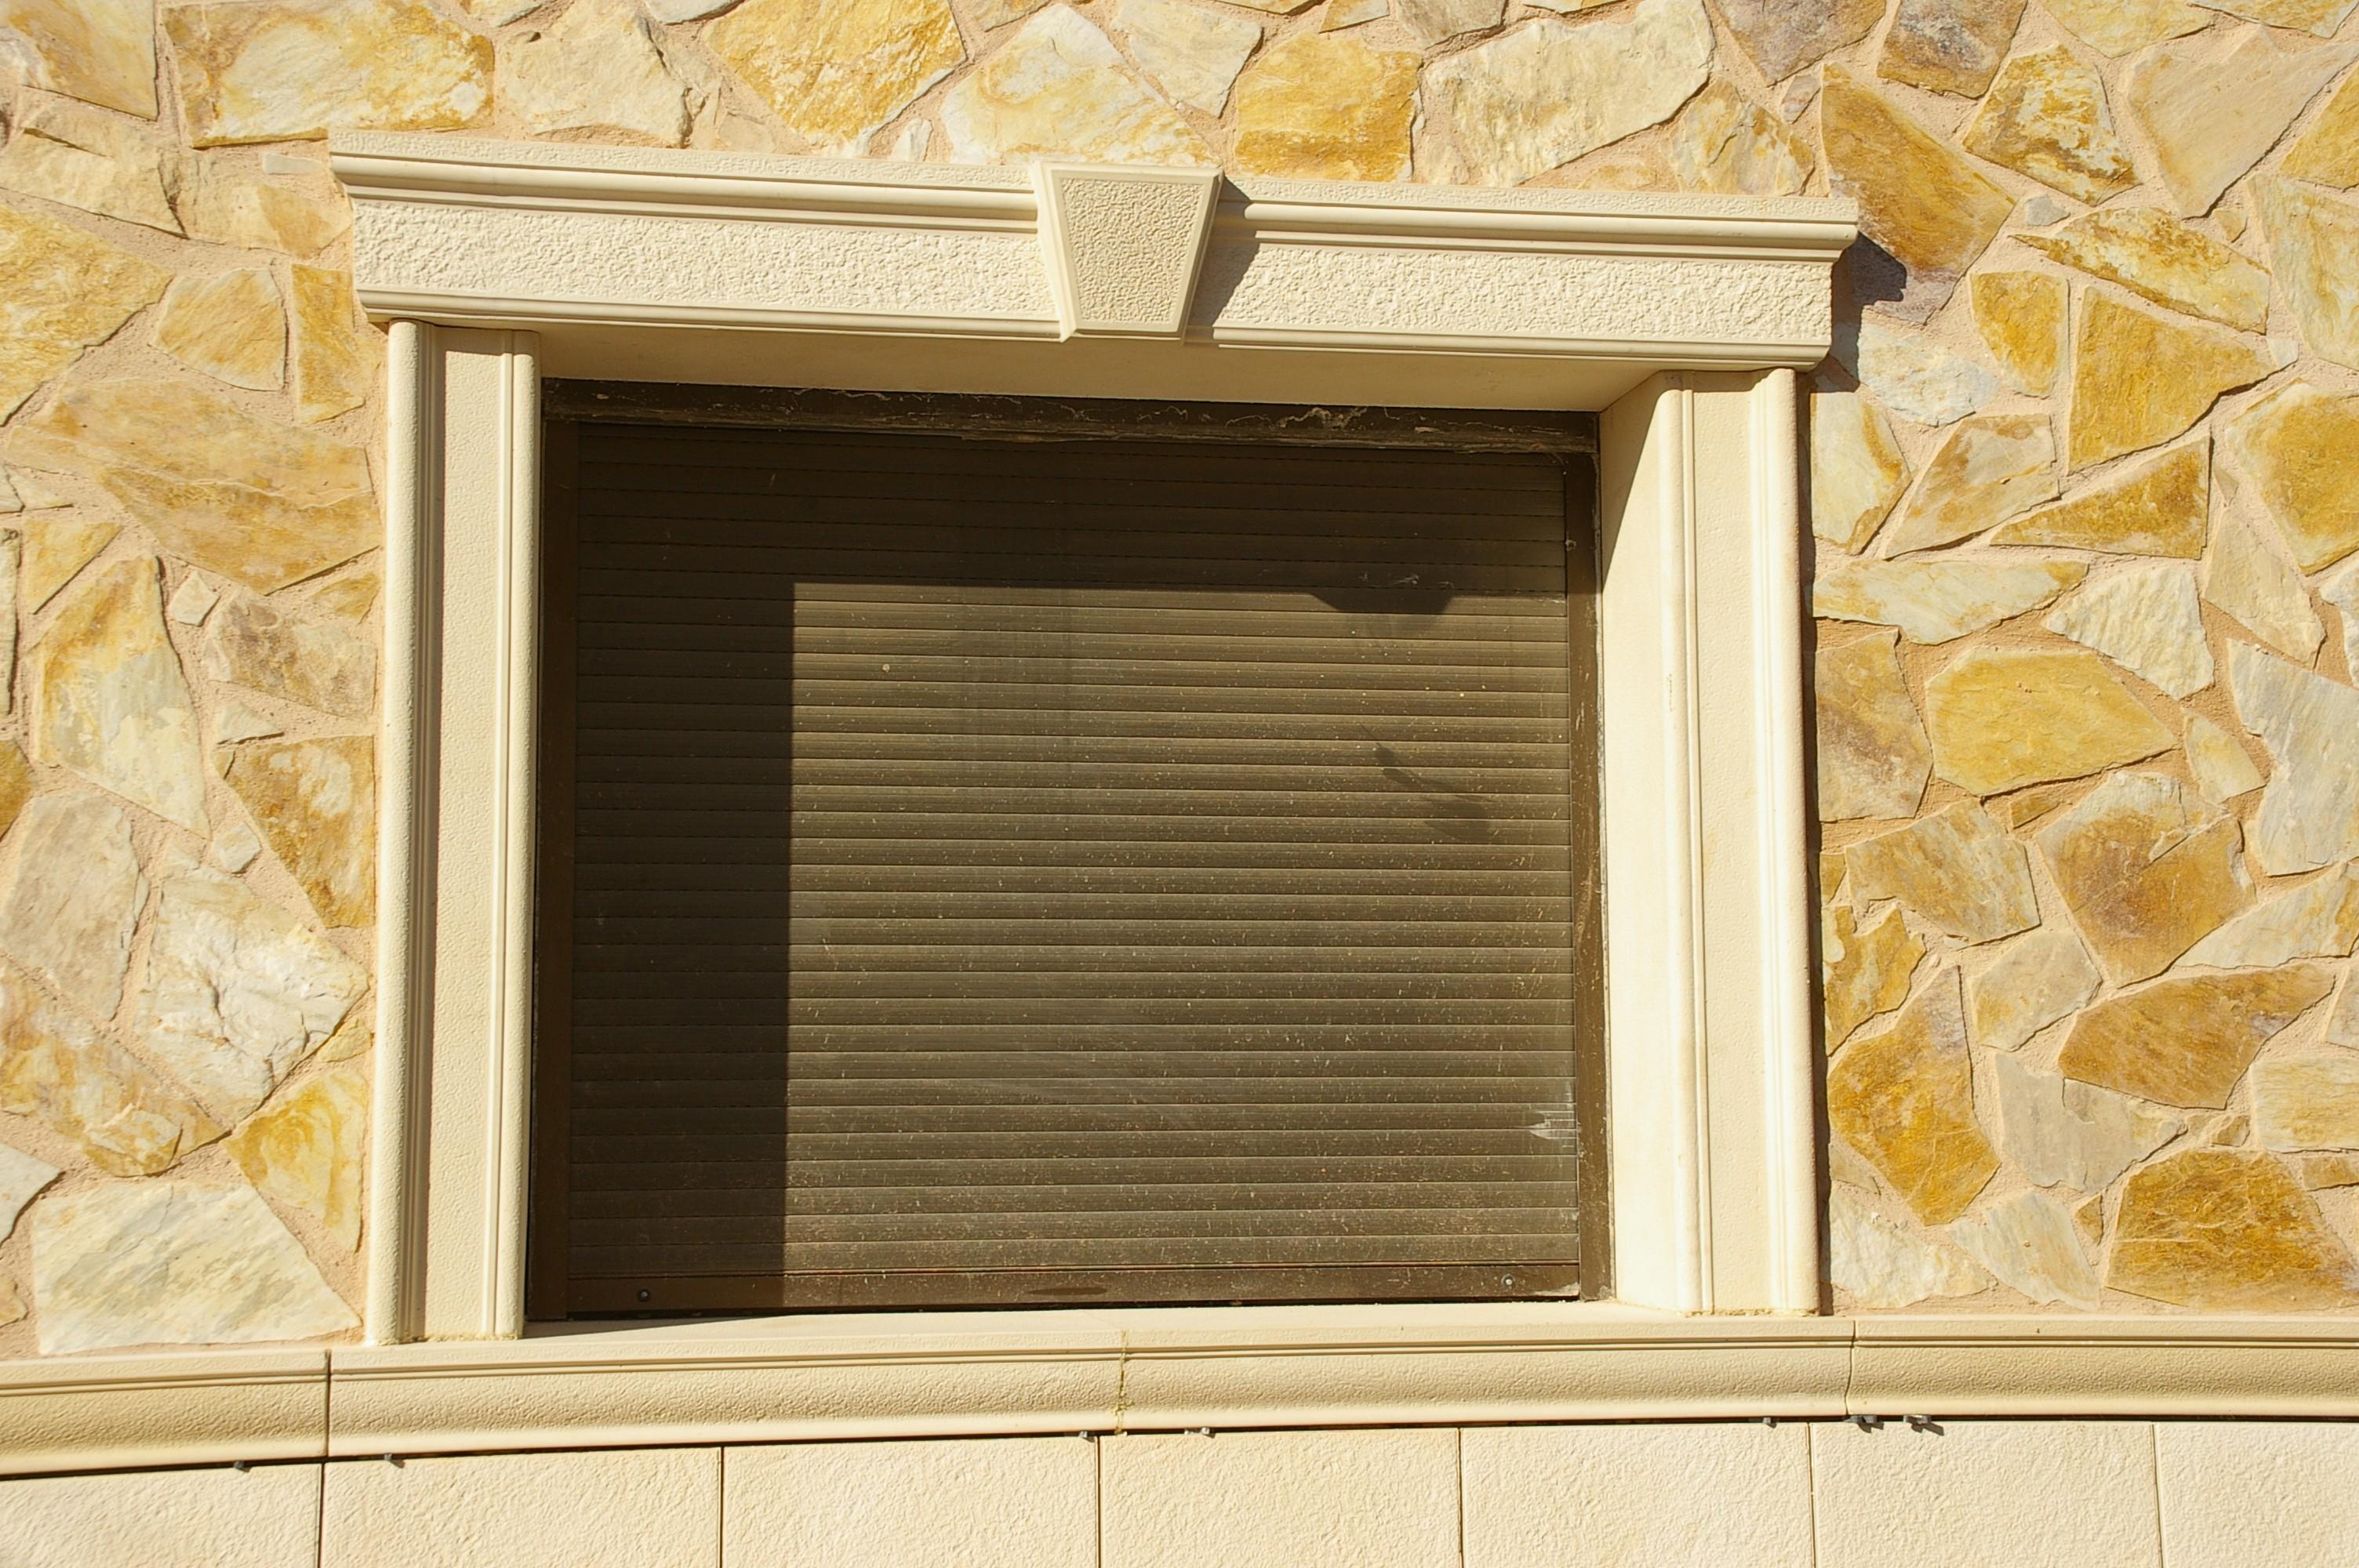 Molduras para ventanas puertas genuardis portal picture - Molduras de puertas ...